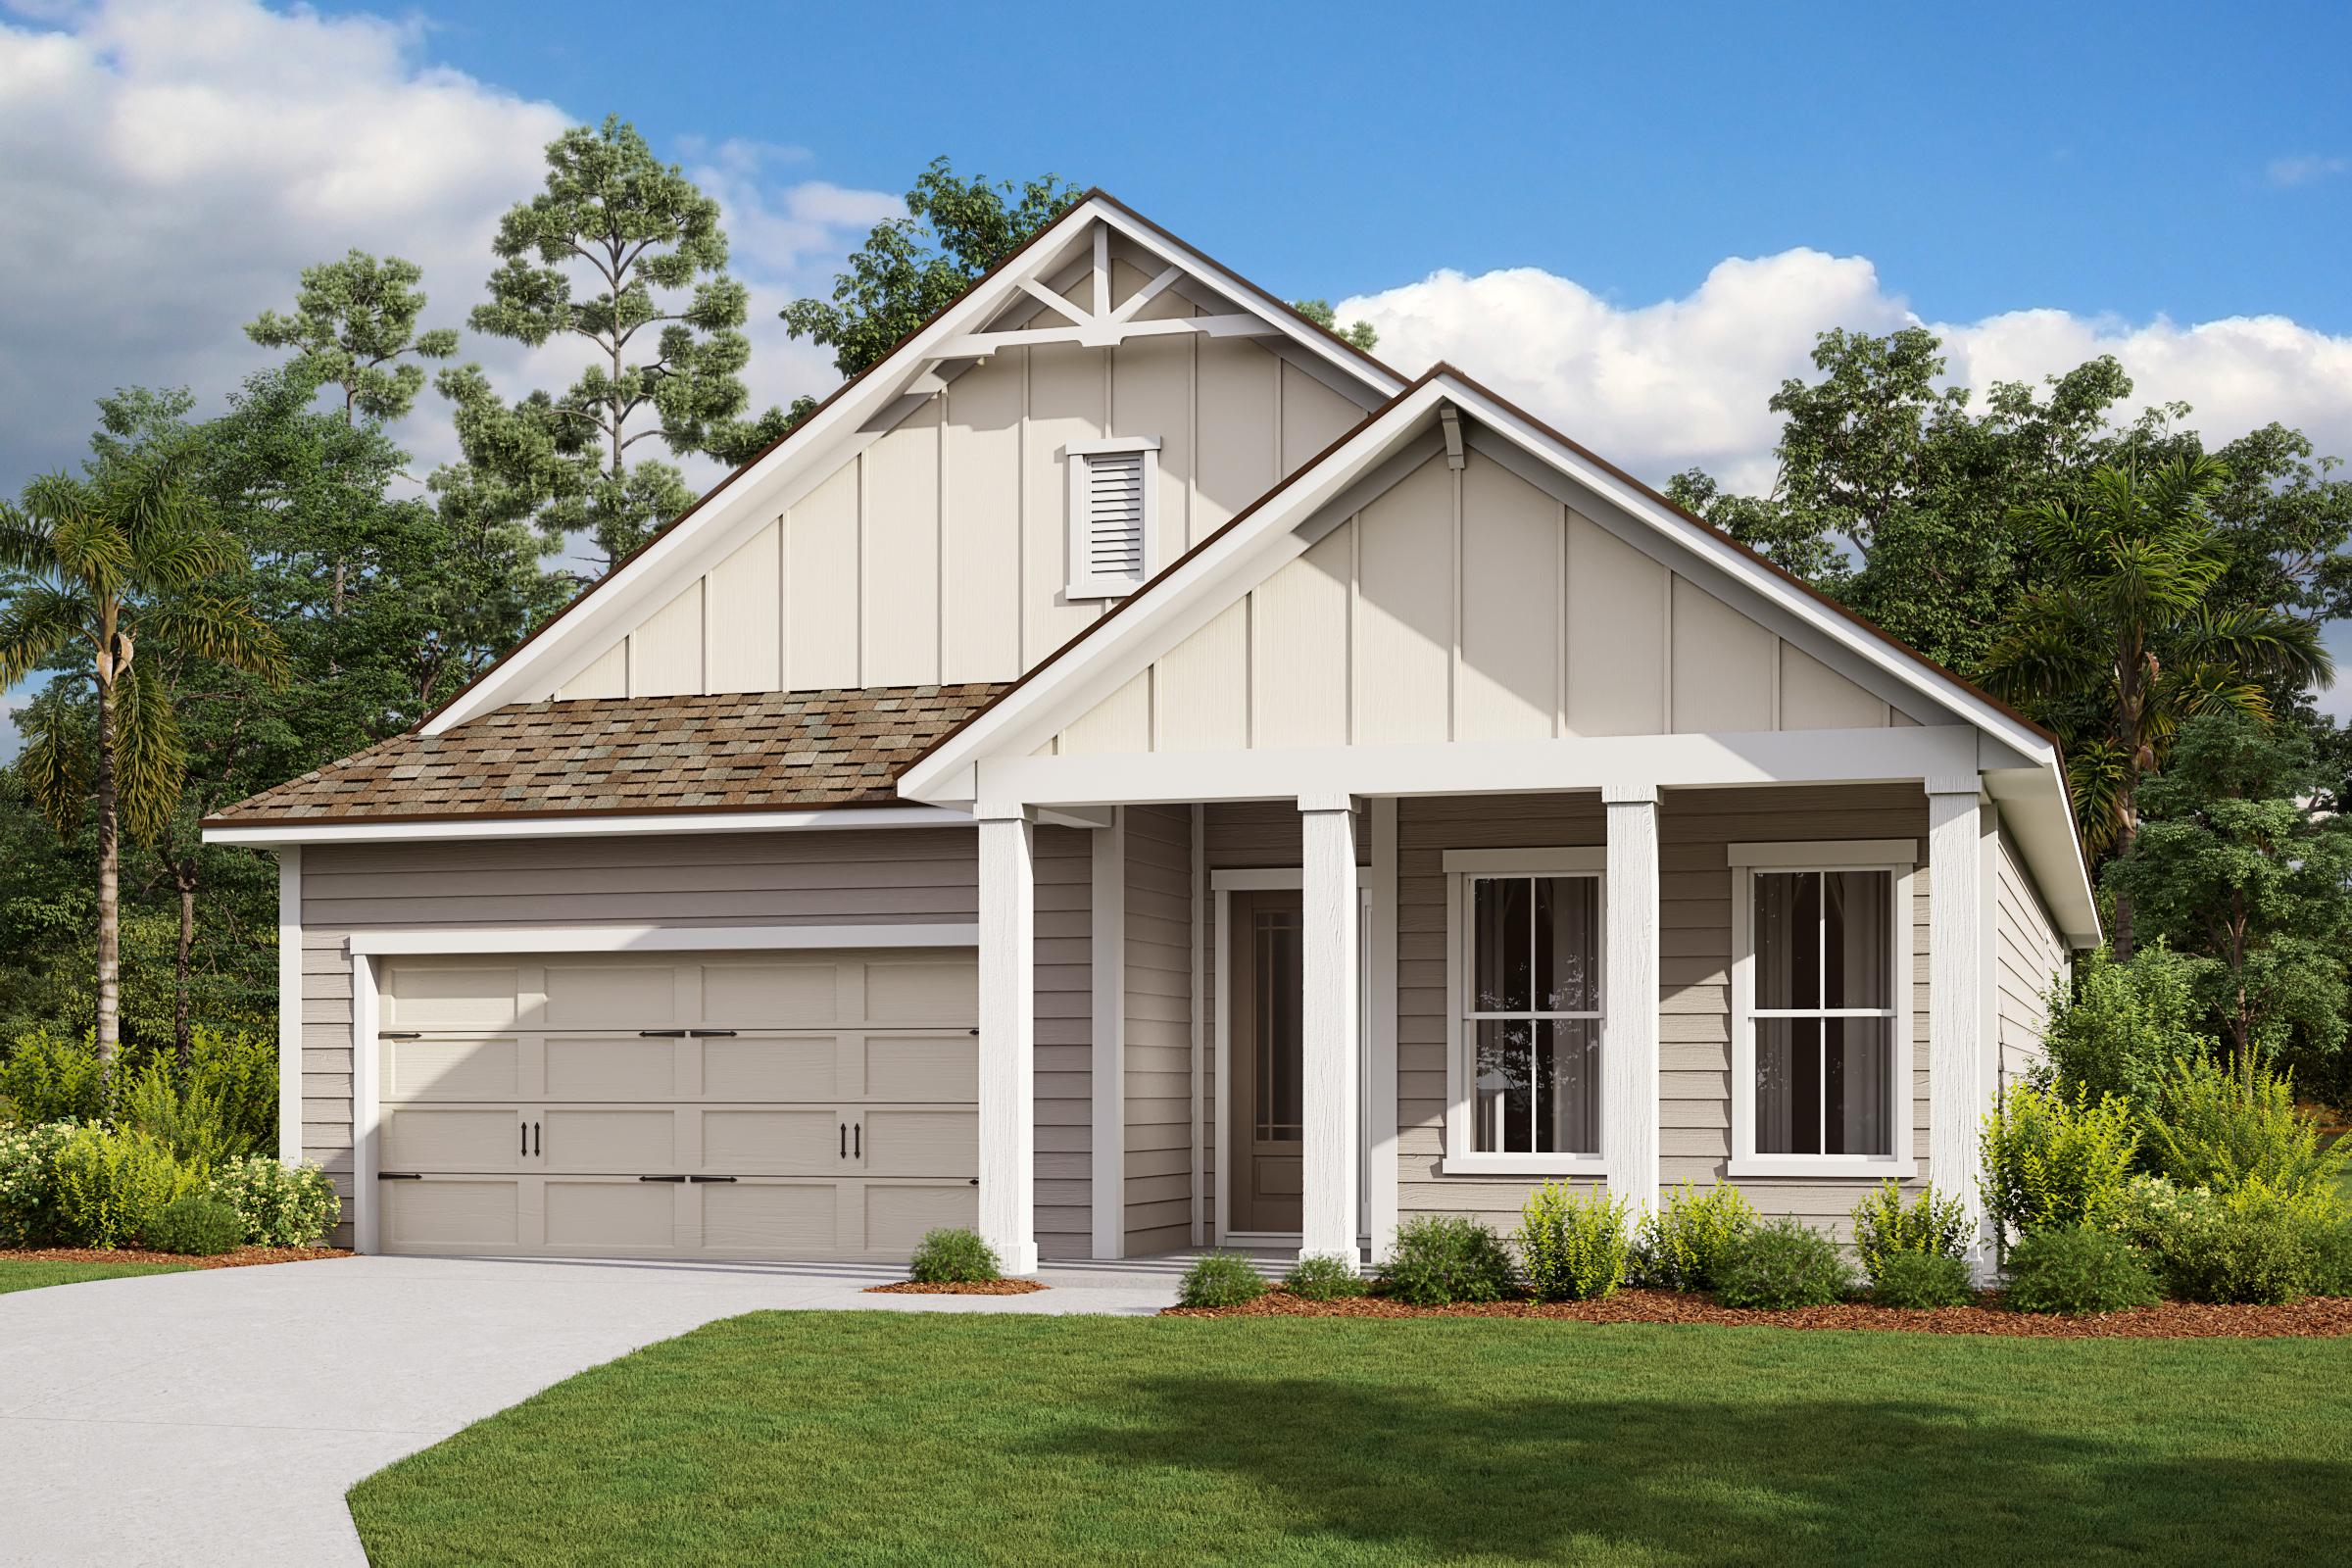 Royal-Florida Farmhouse-Elevation